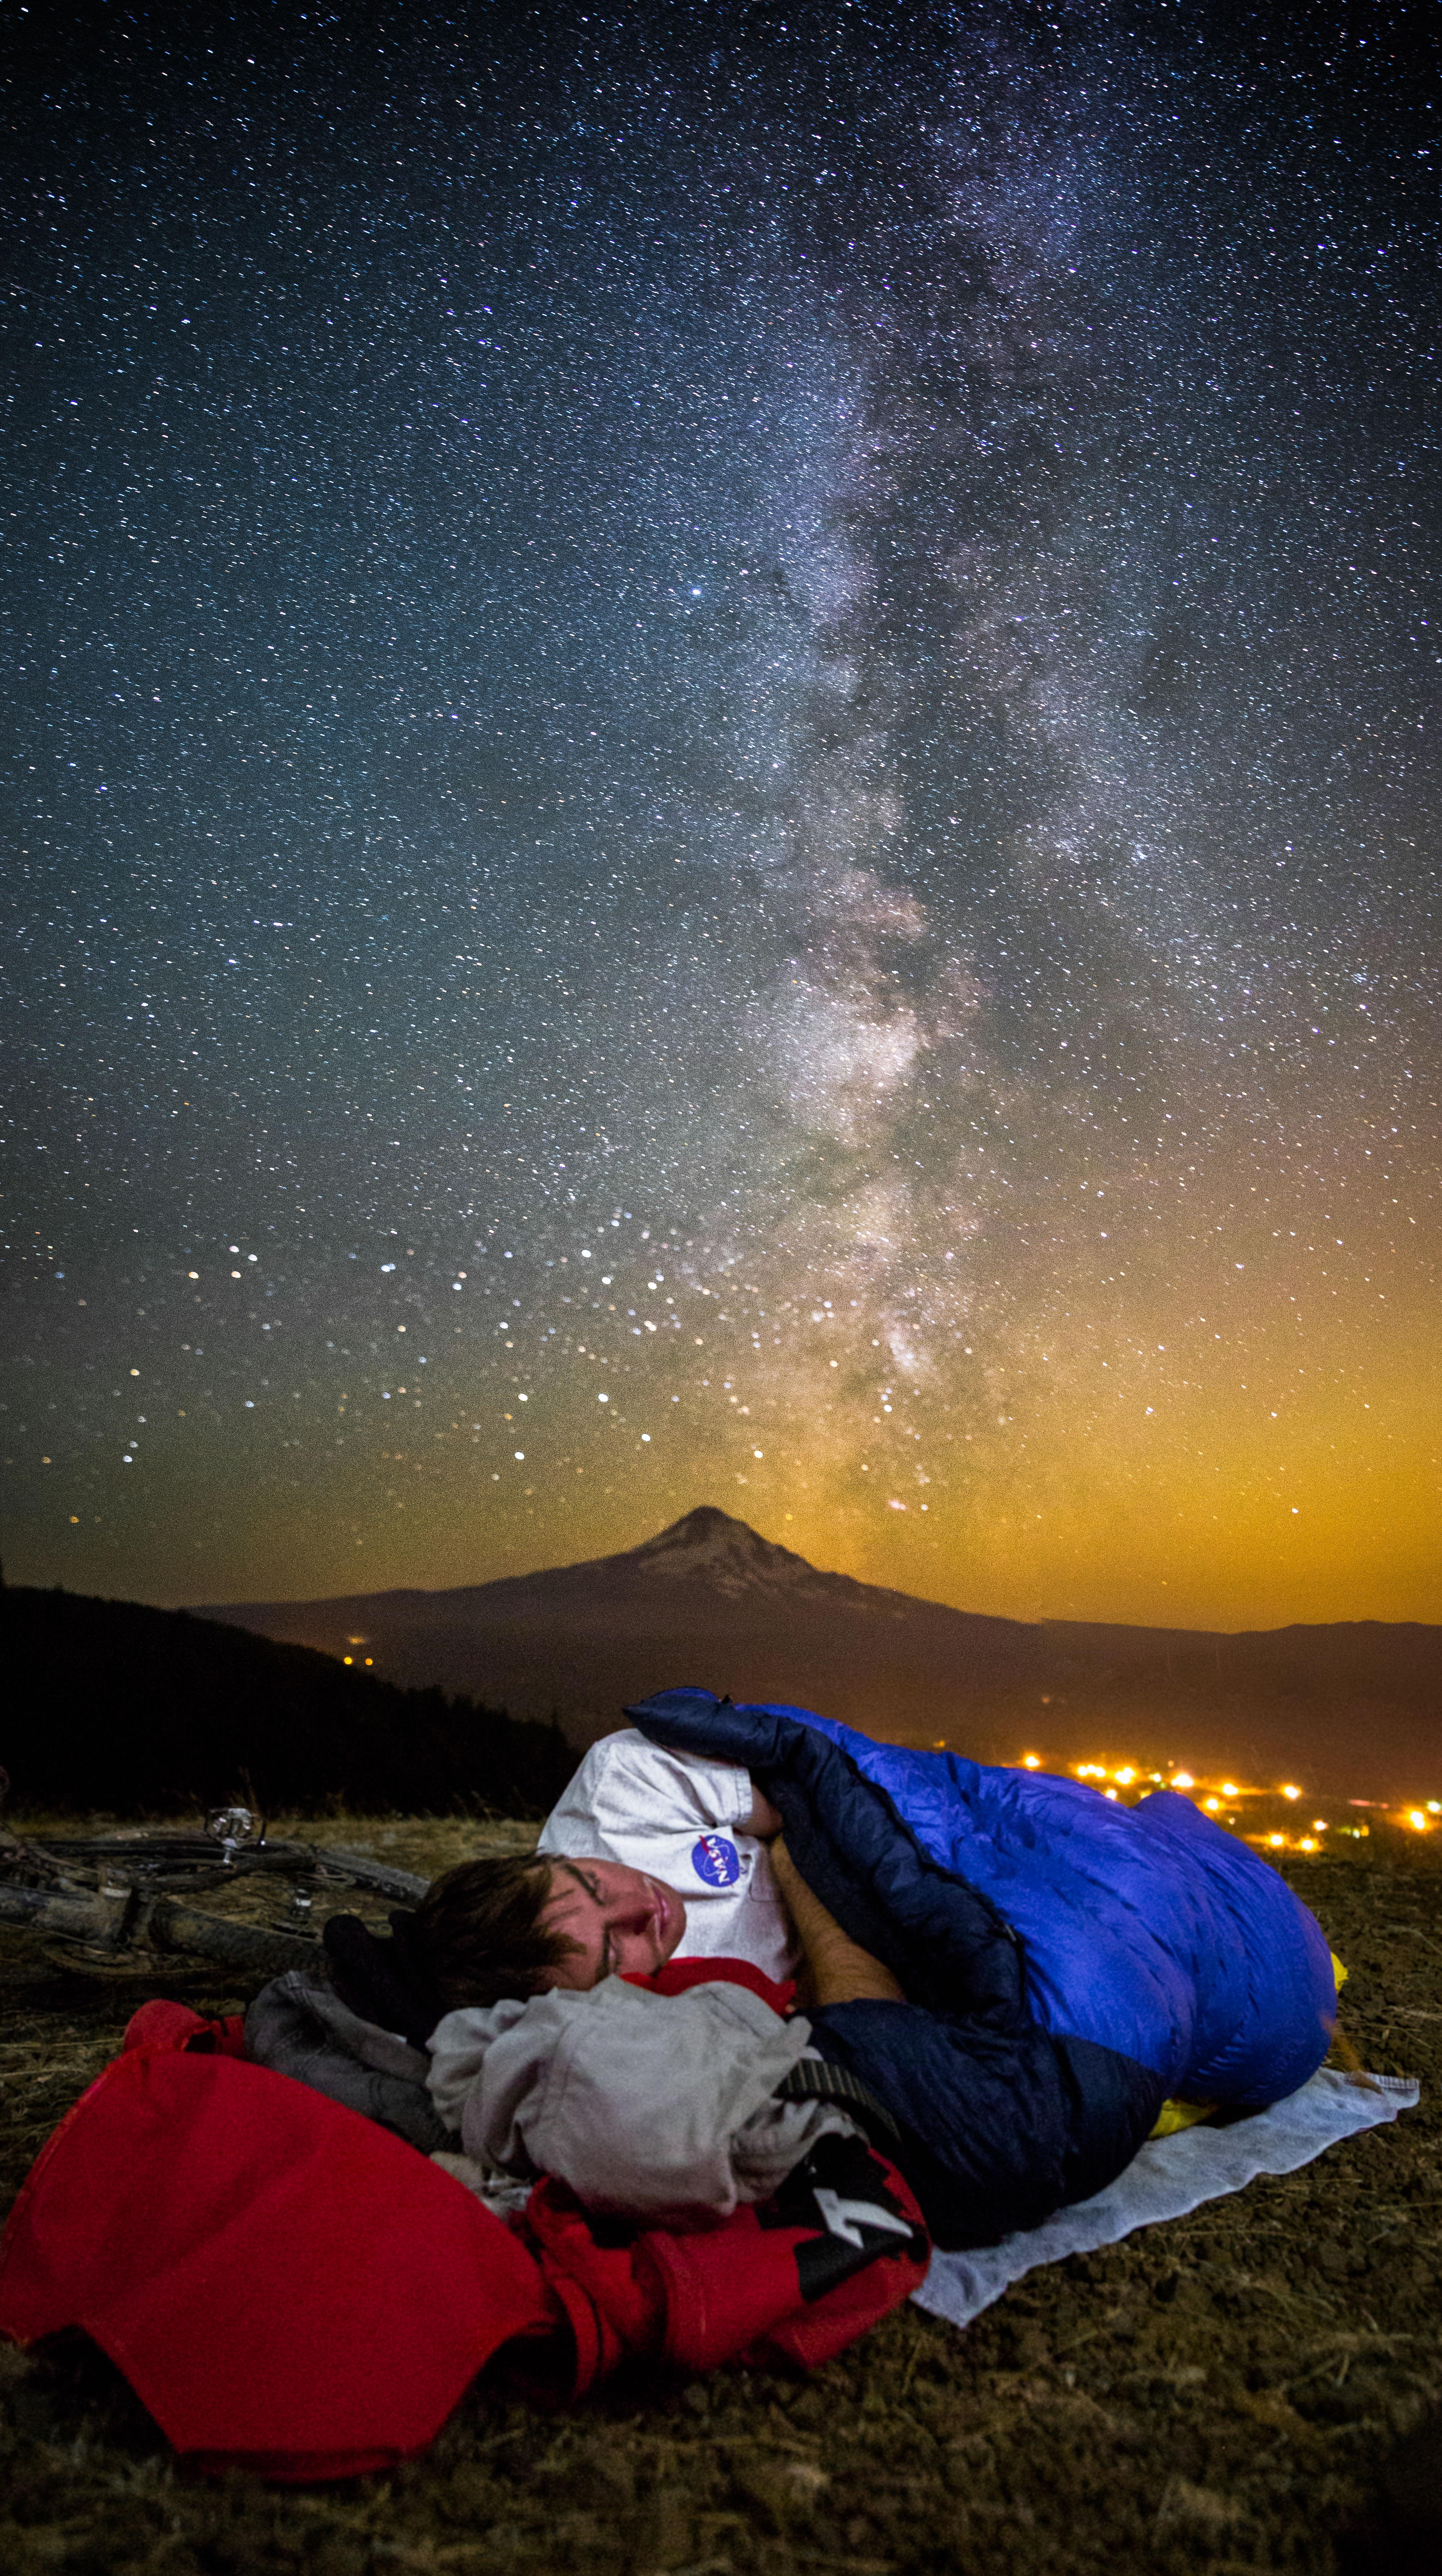 Free Images : Silhouette, Mountain, Light, Sky, Night